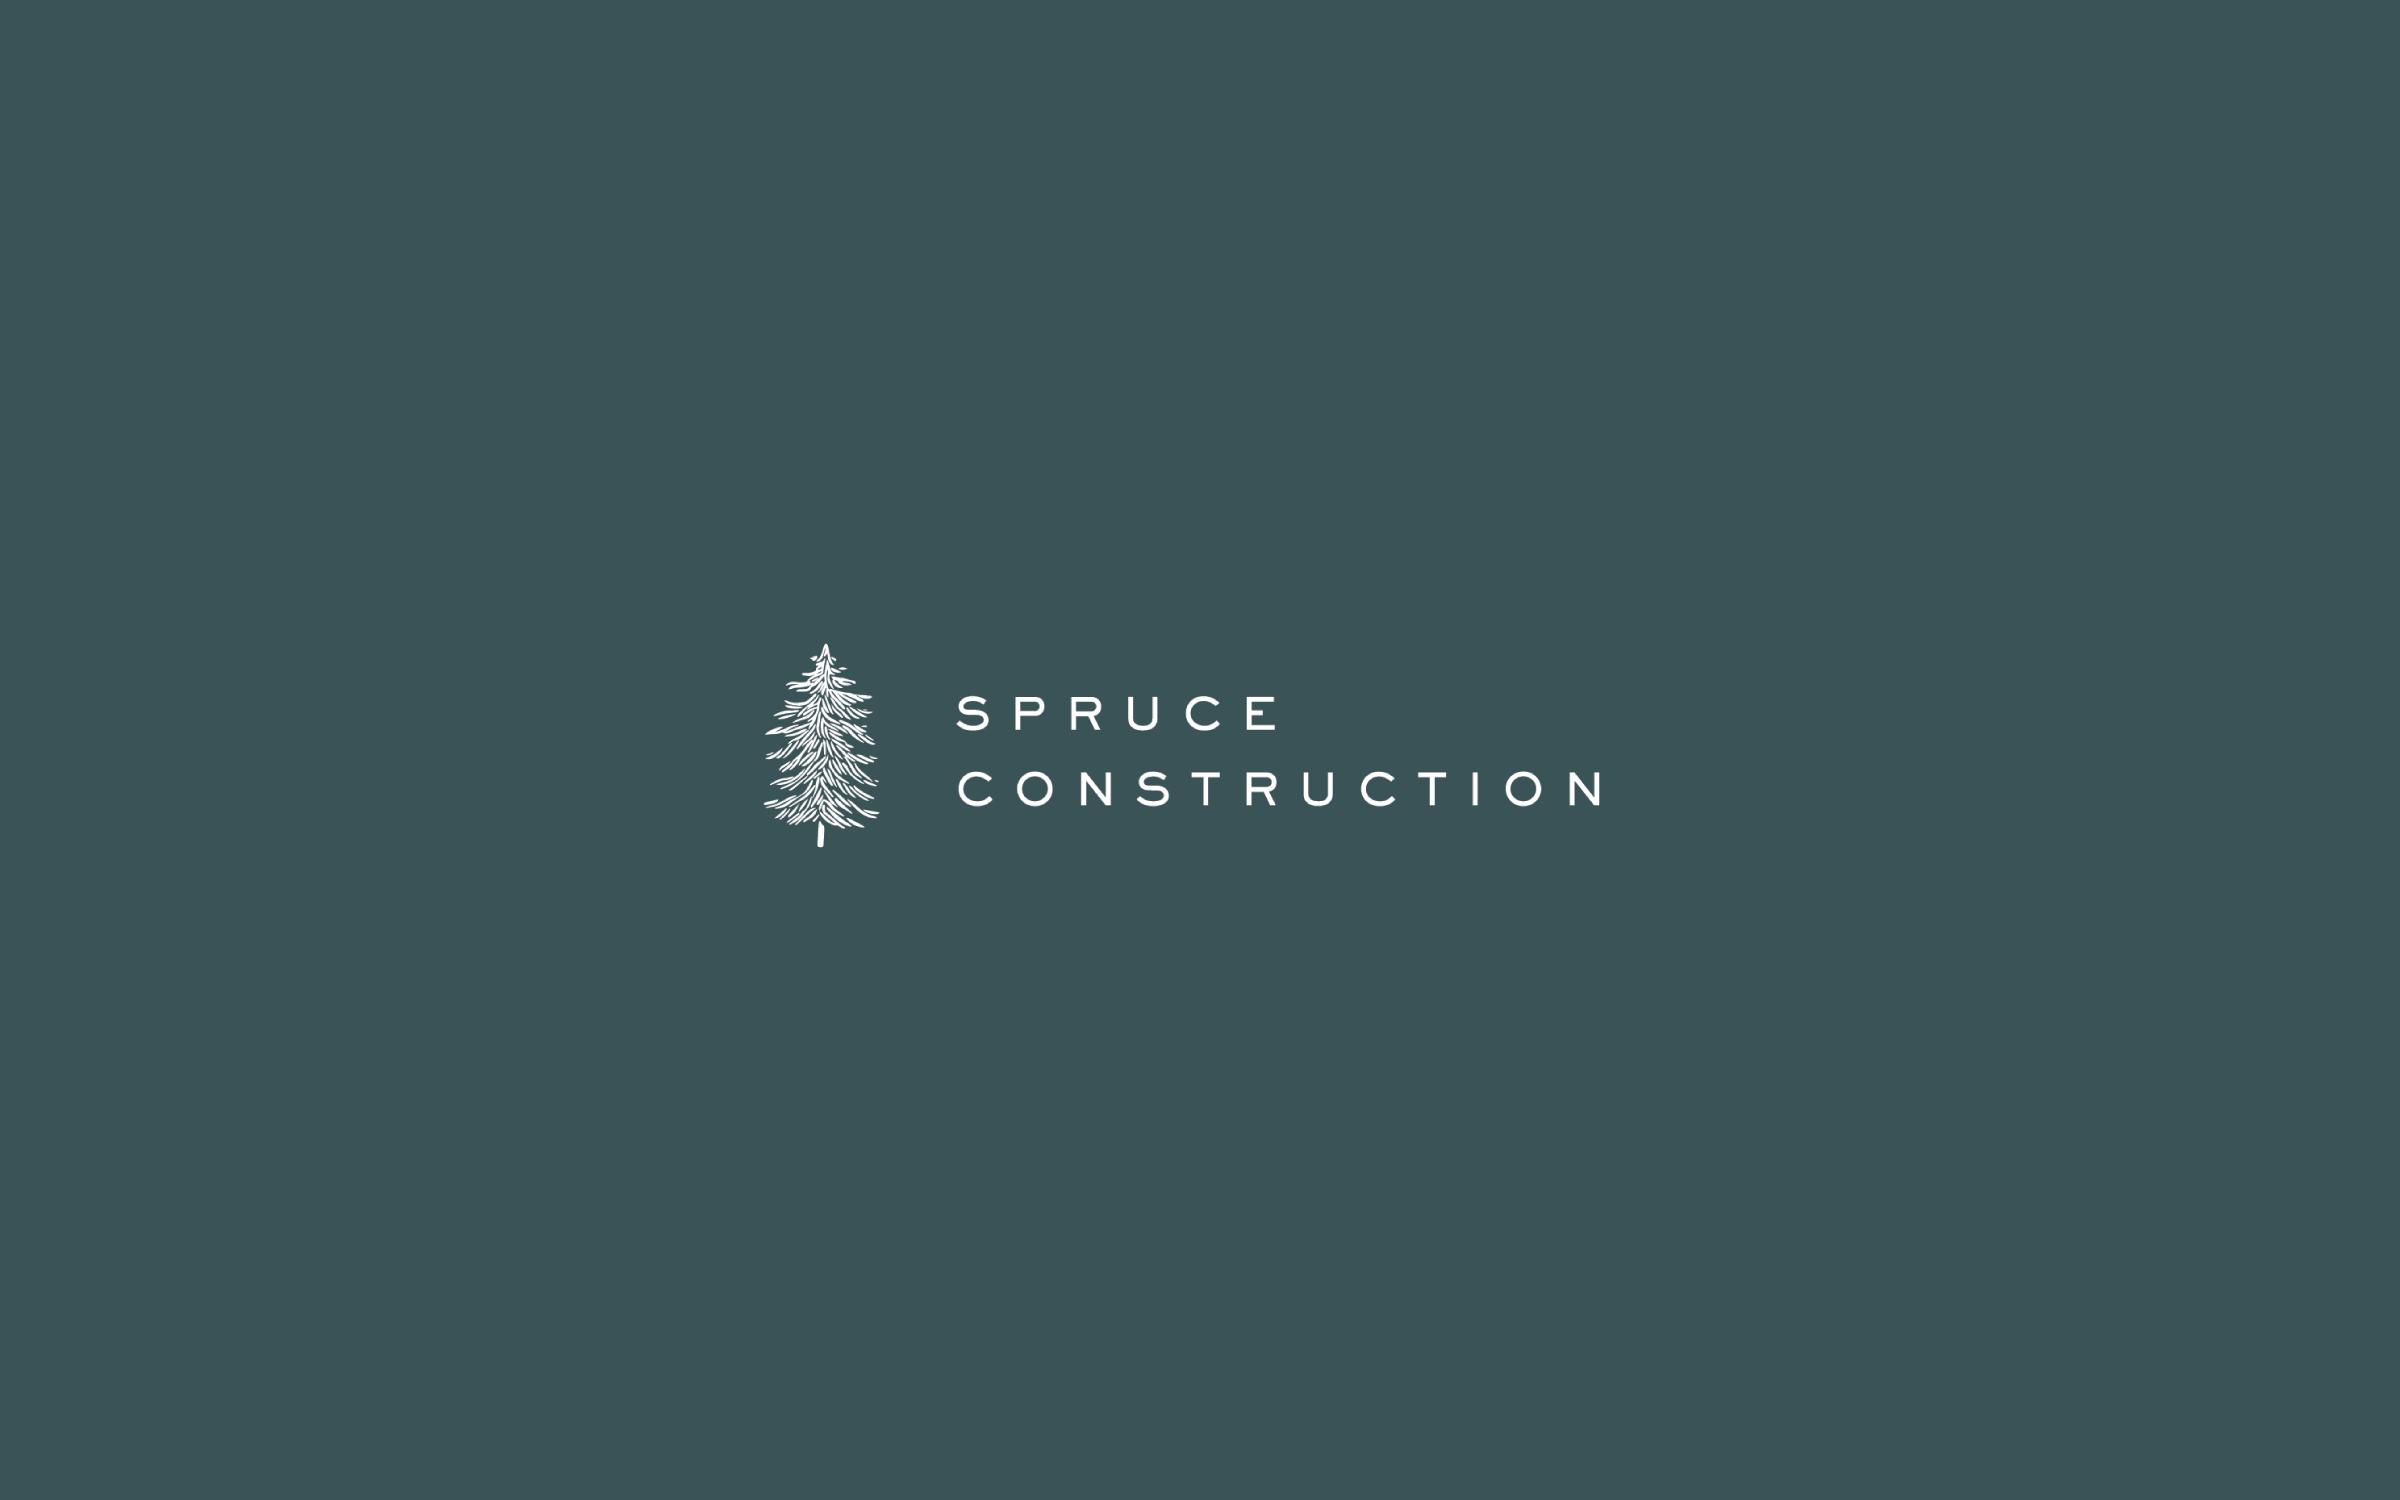 Spruce Construction-26.jpg